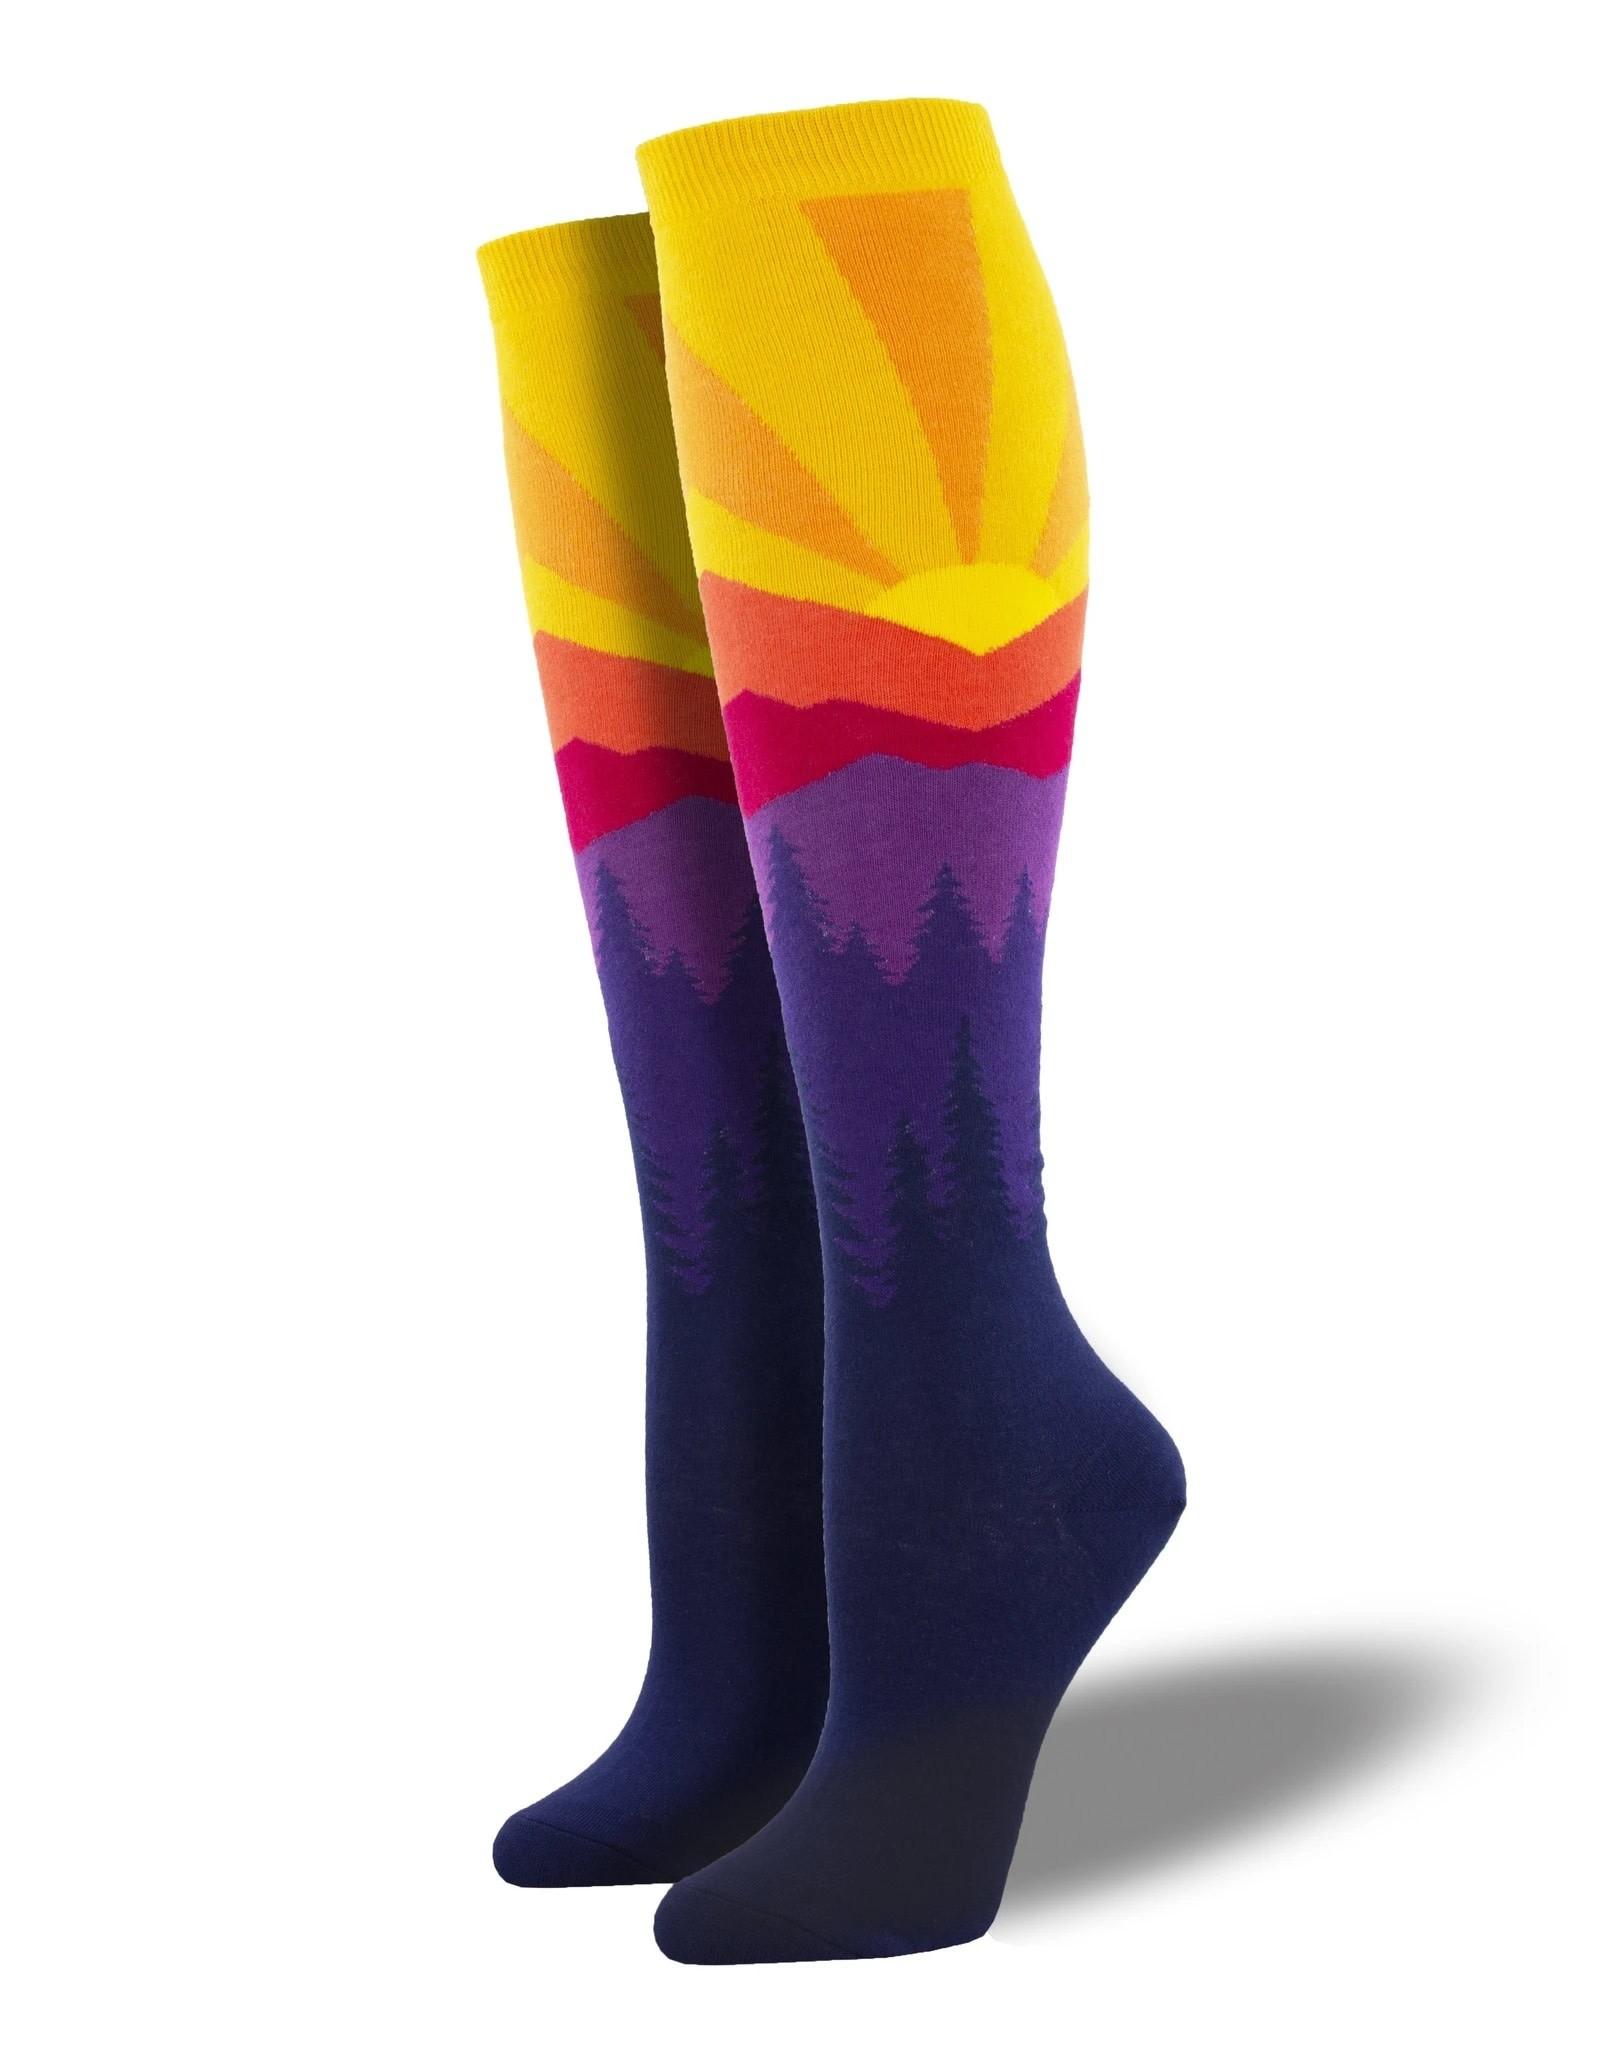 Socksmith SS Knee High Socks